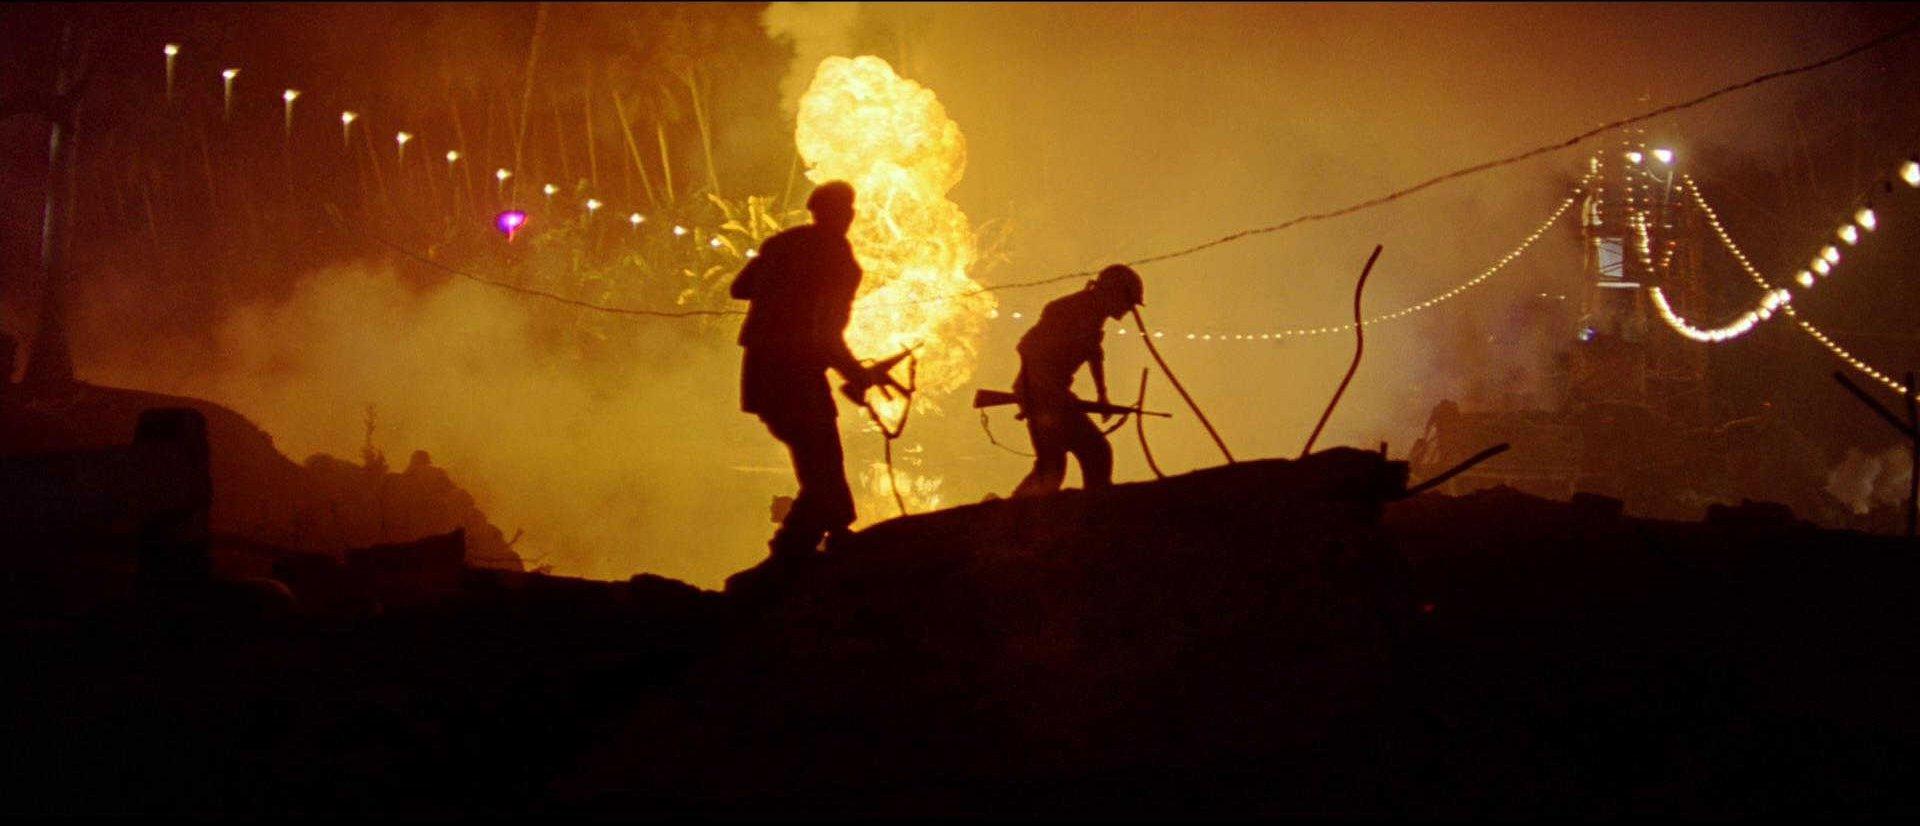 Апокалипсис сегодня Apocalypse Now(1979), оператор Витторио Стораро (режиссер Фрэнсис Форд Коппола)